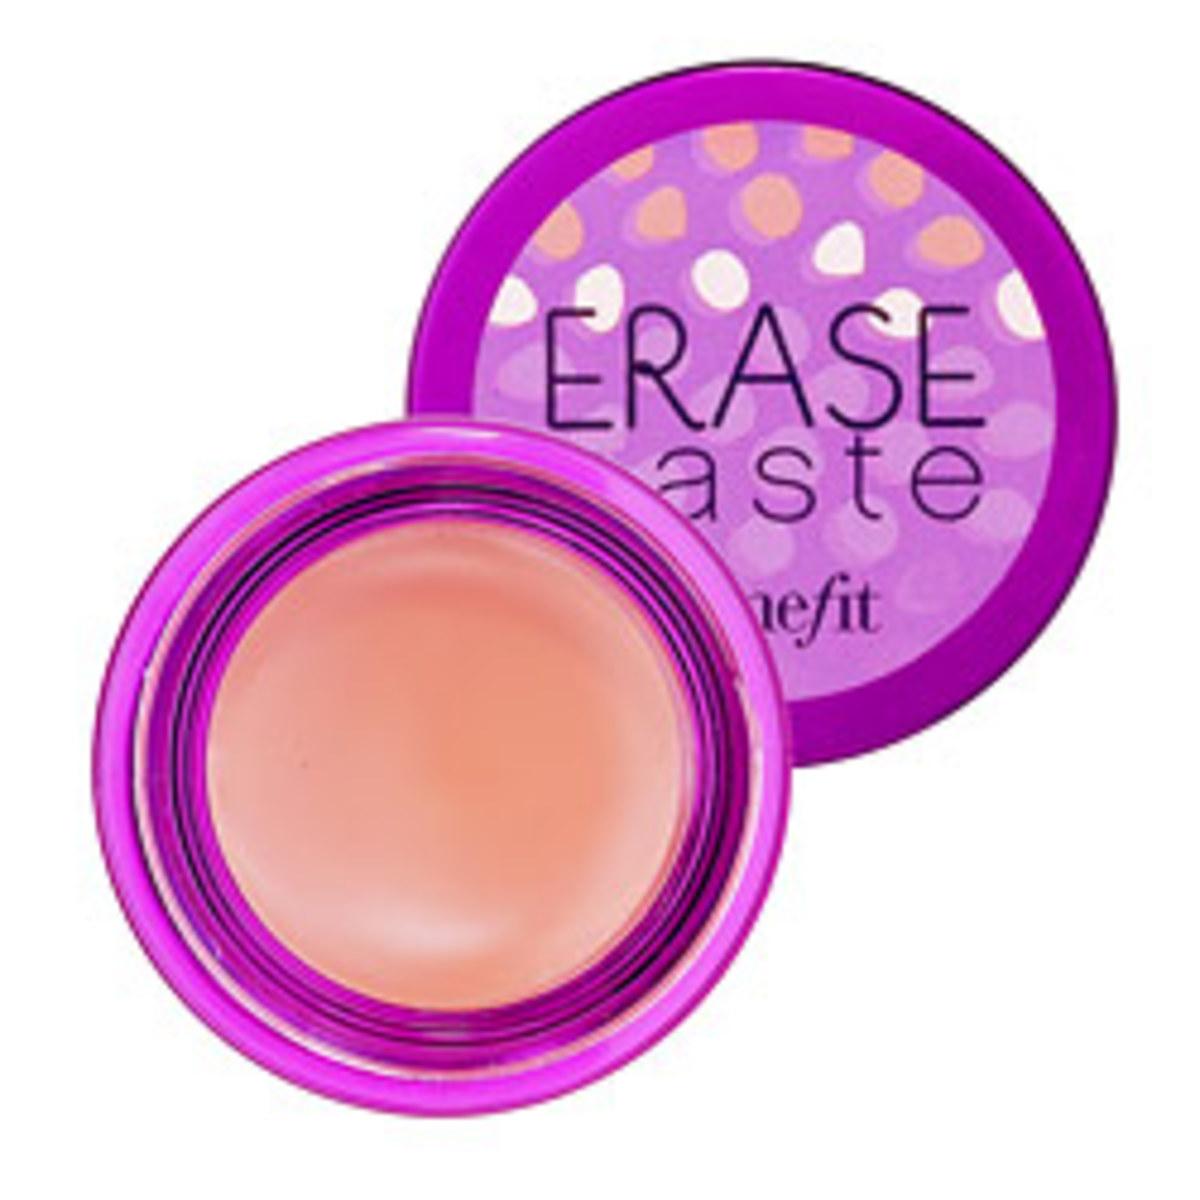 Benefit-Erase-Paste-Concealer